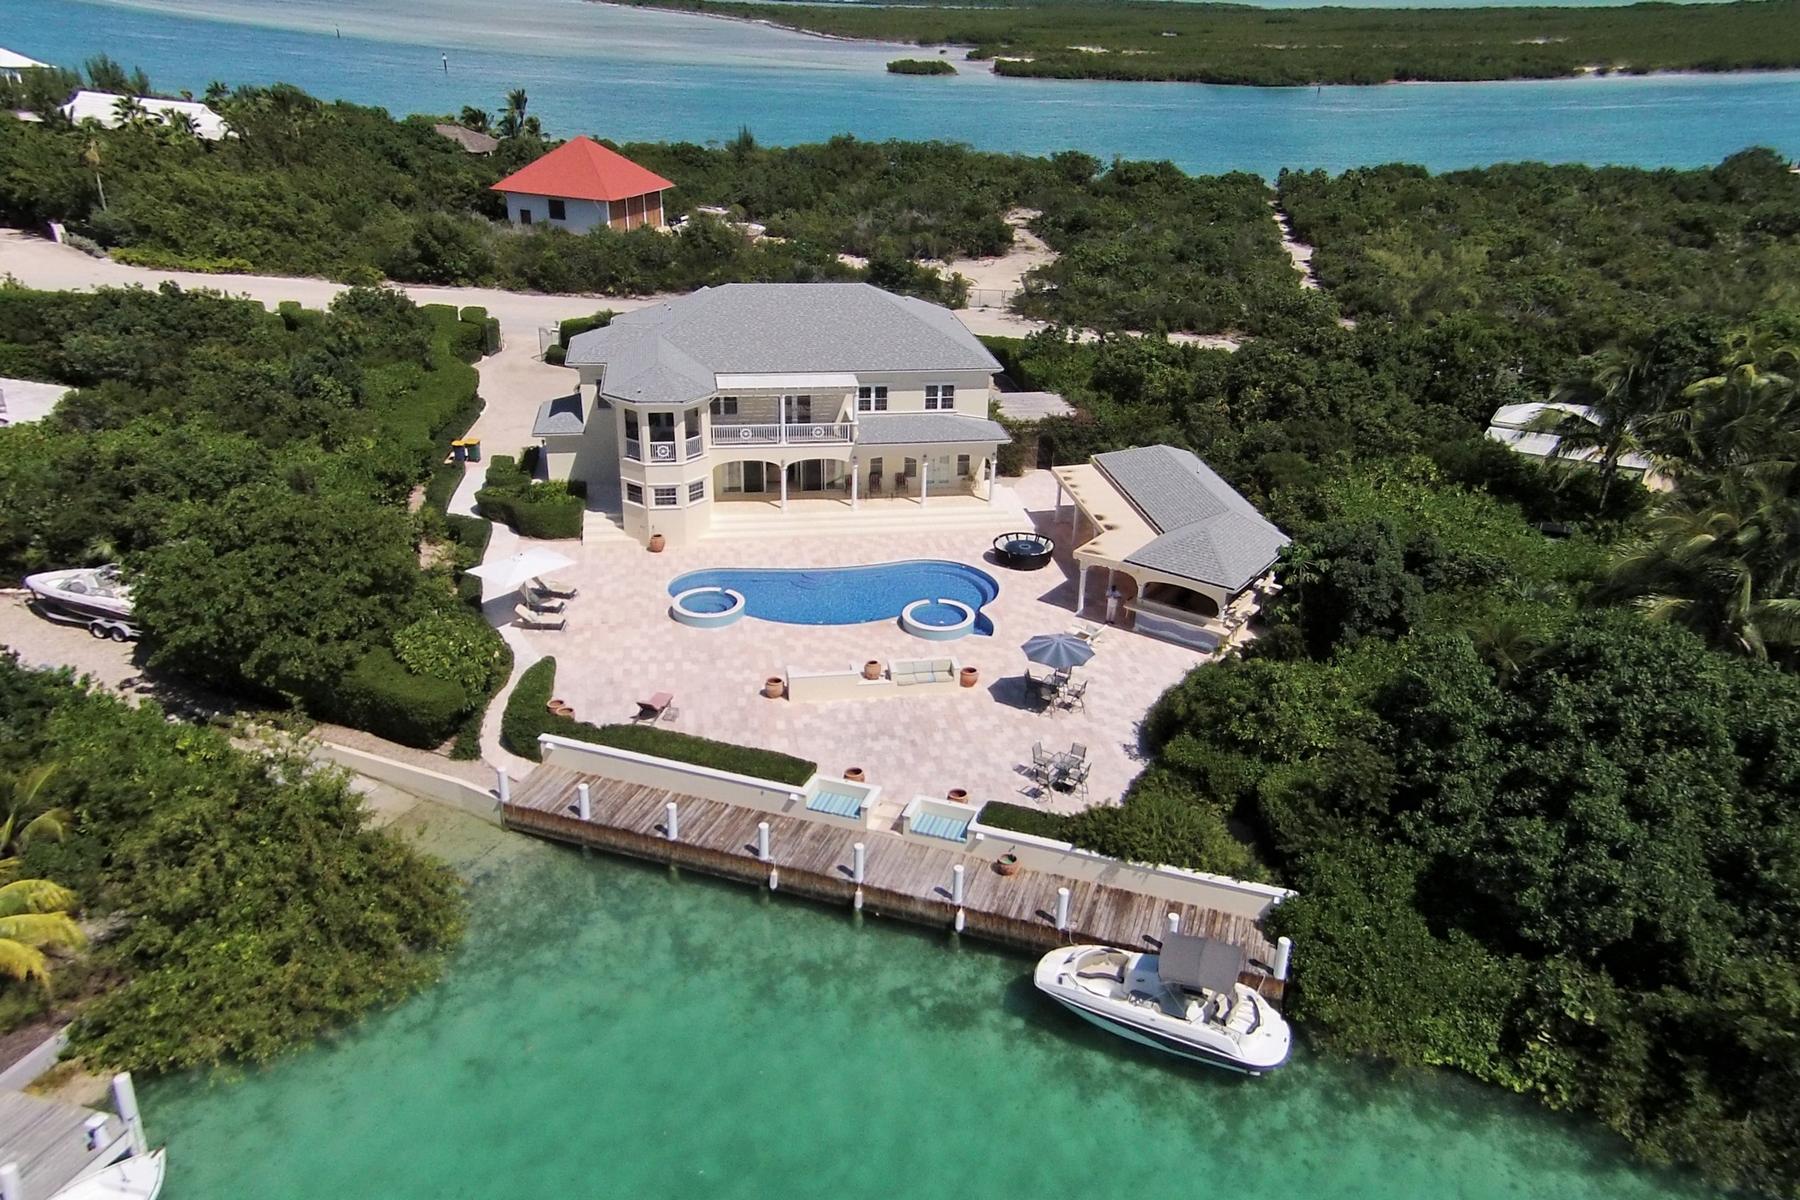 Tek Ailelik Ev için Satış at Rafters Leeward, Providenciales Turks Ve Caicos Adalari